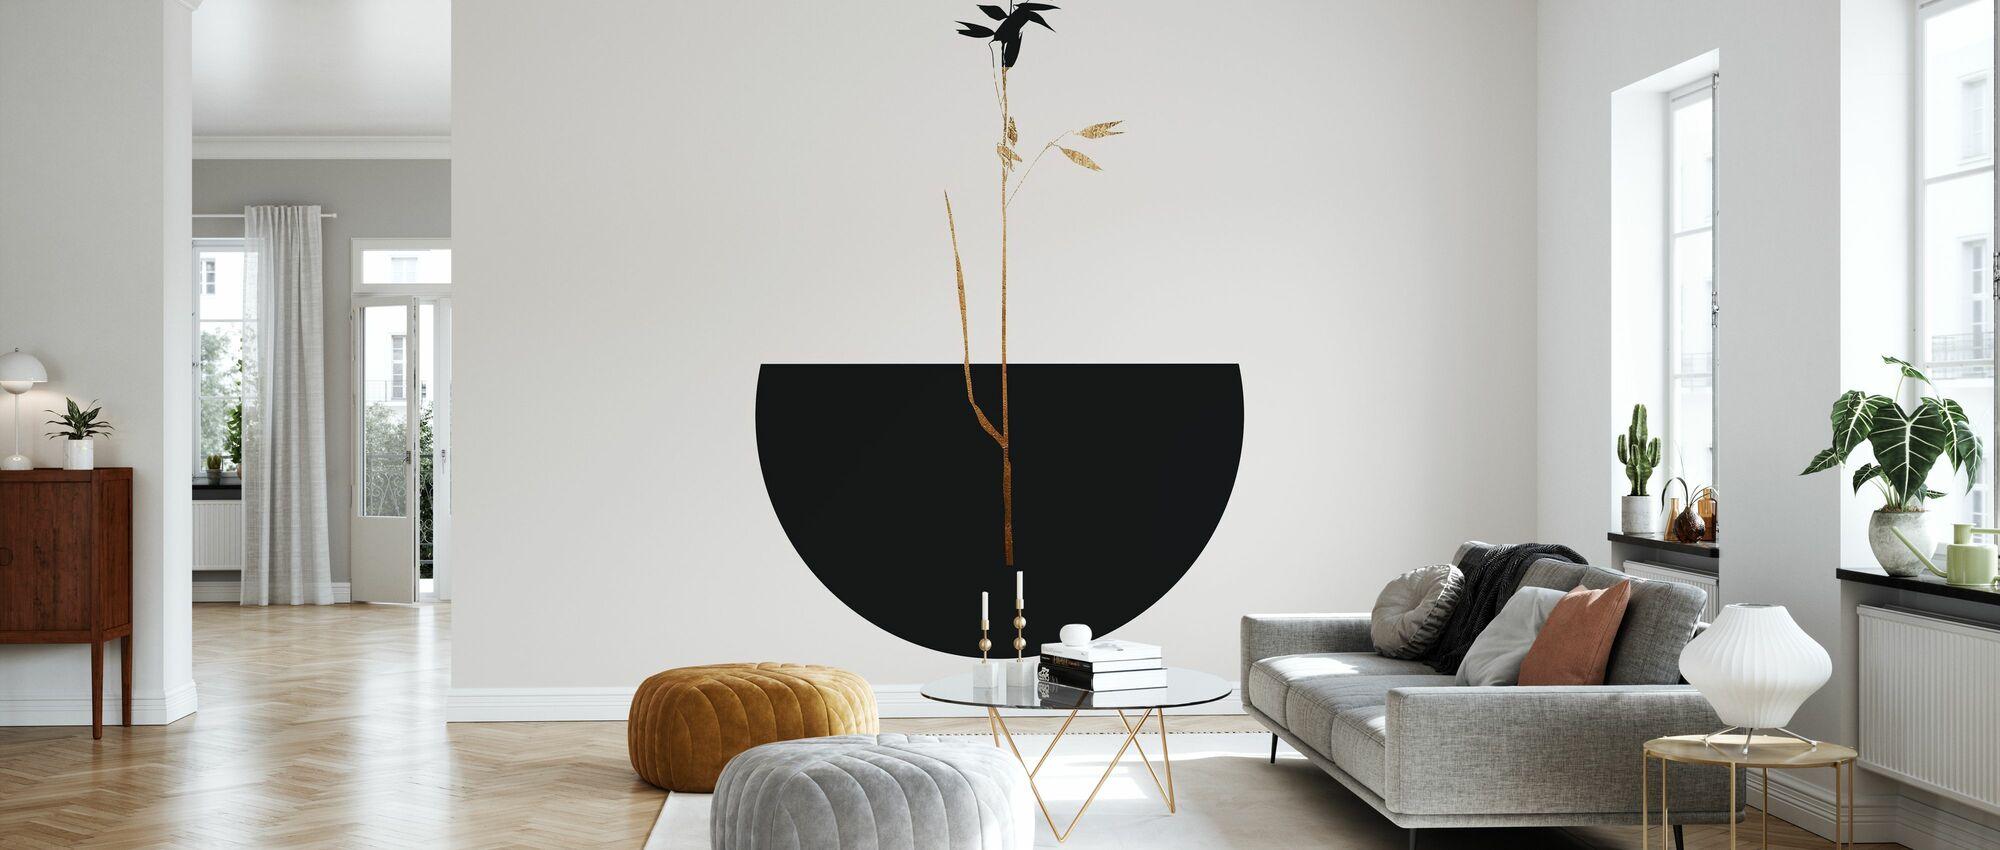 Zwarte Plant - Behang - Woonkamer